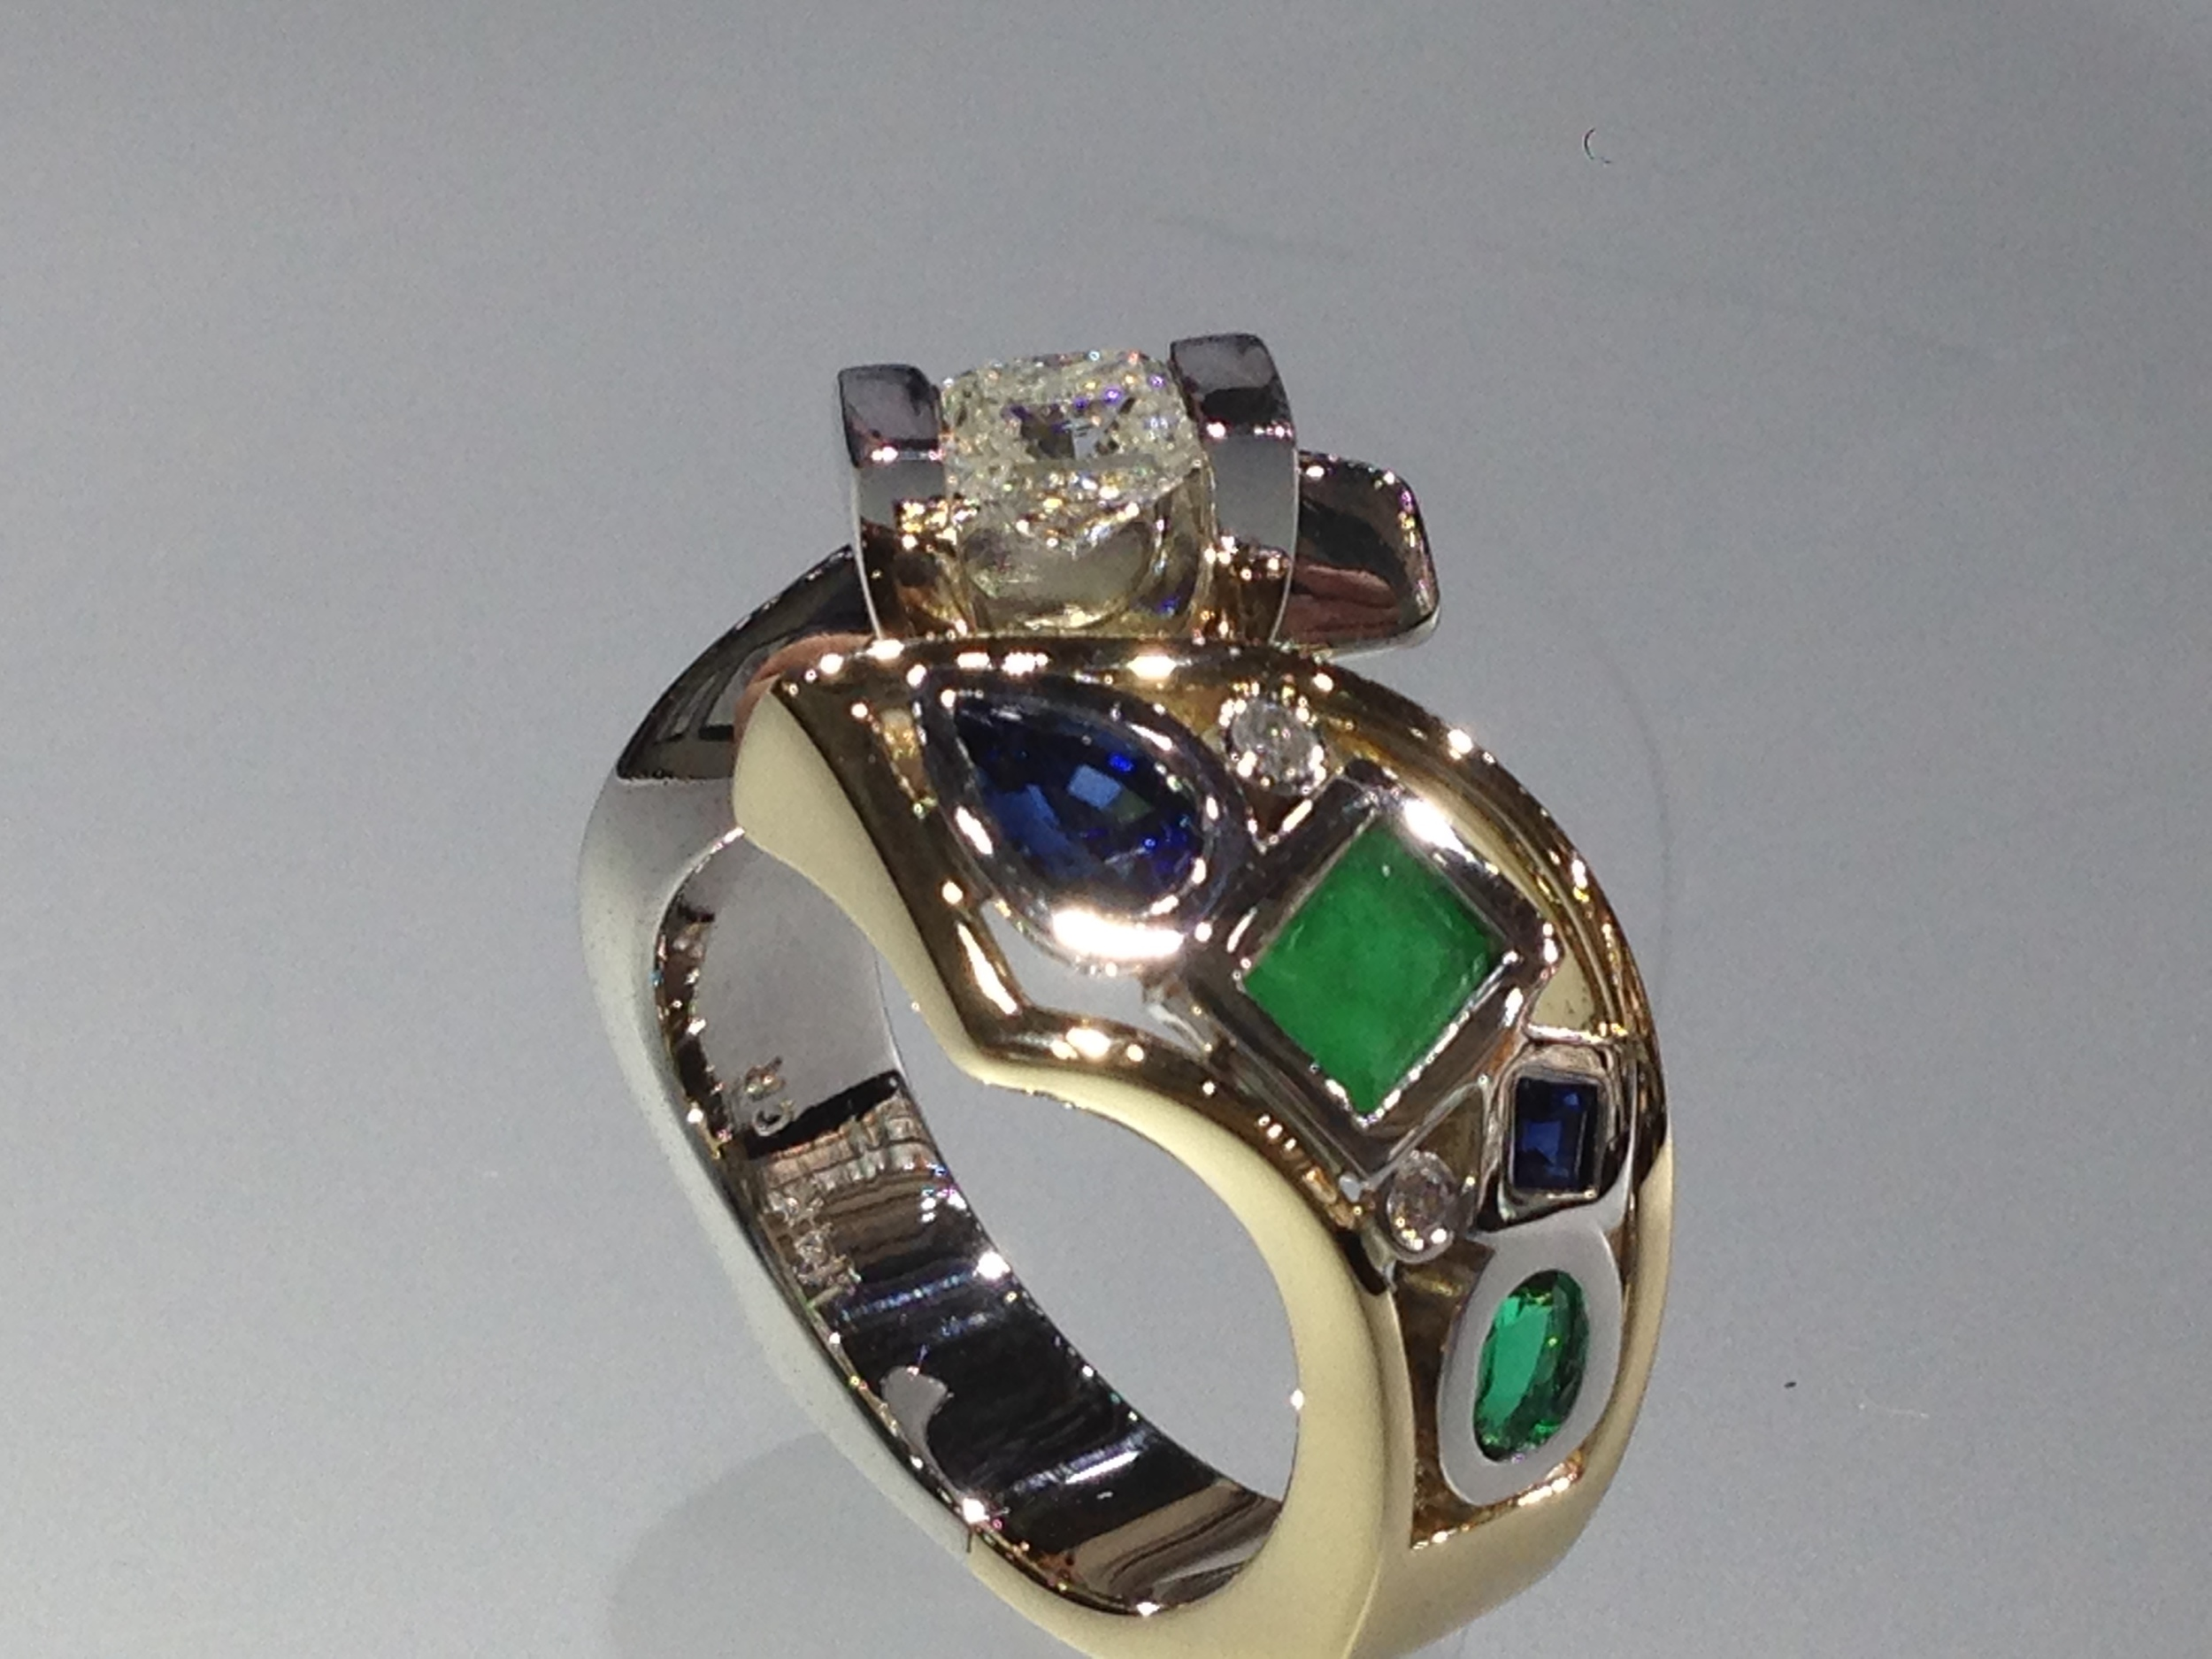 side-view-unique-pear-shape-sapphire-princess-cut-oval-emerald-princess-cut-diamond-unique-engagement-ring-craft-revival-jewelry-store-grand-rapids